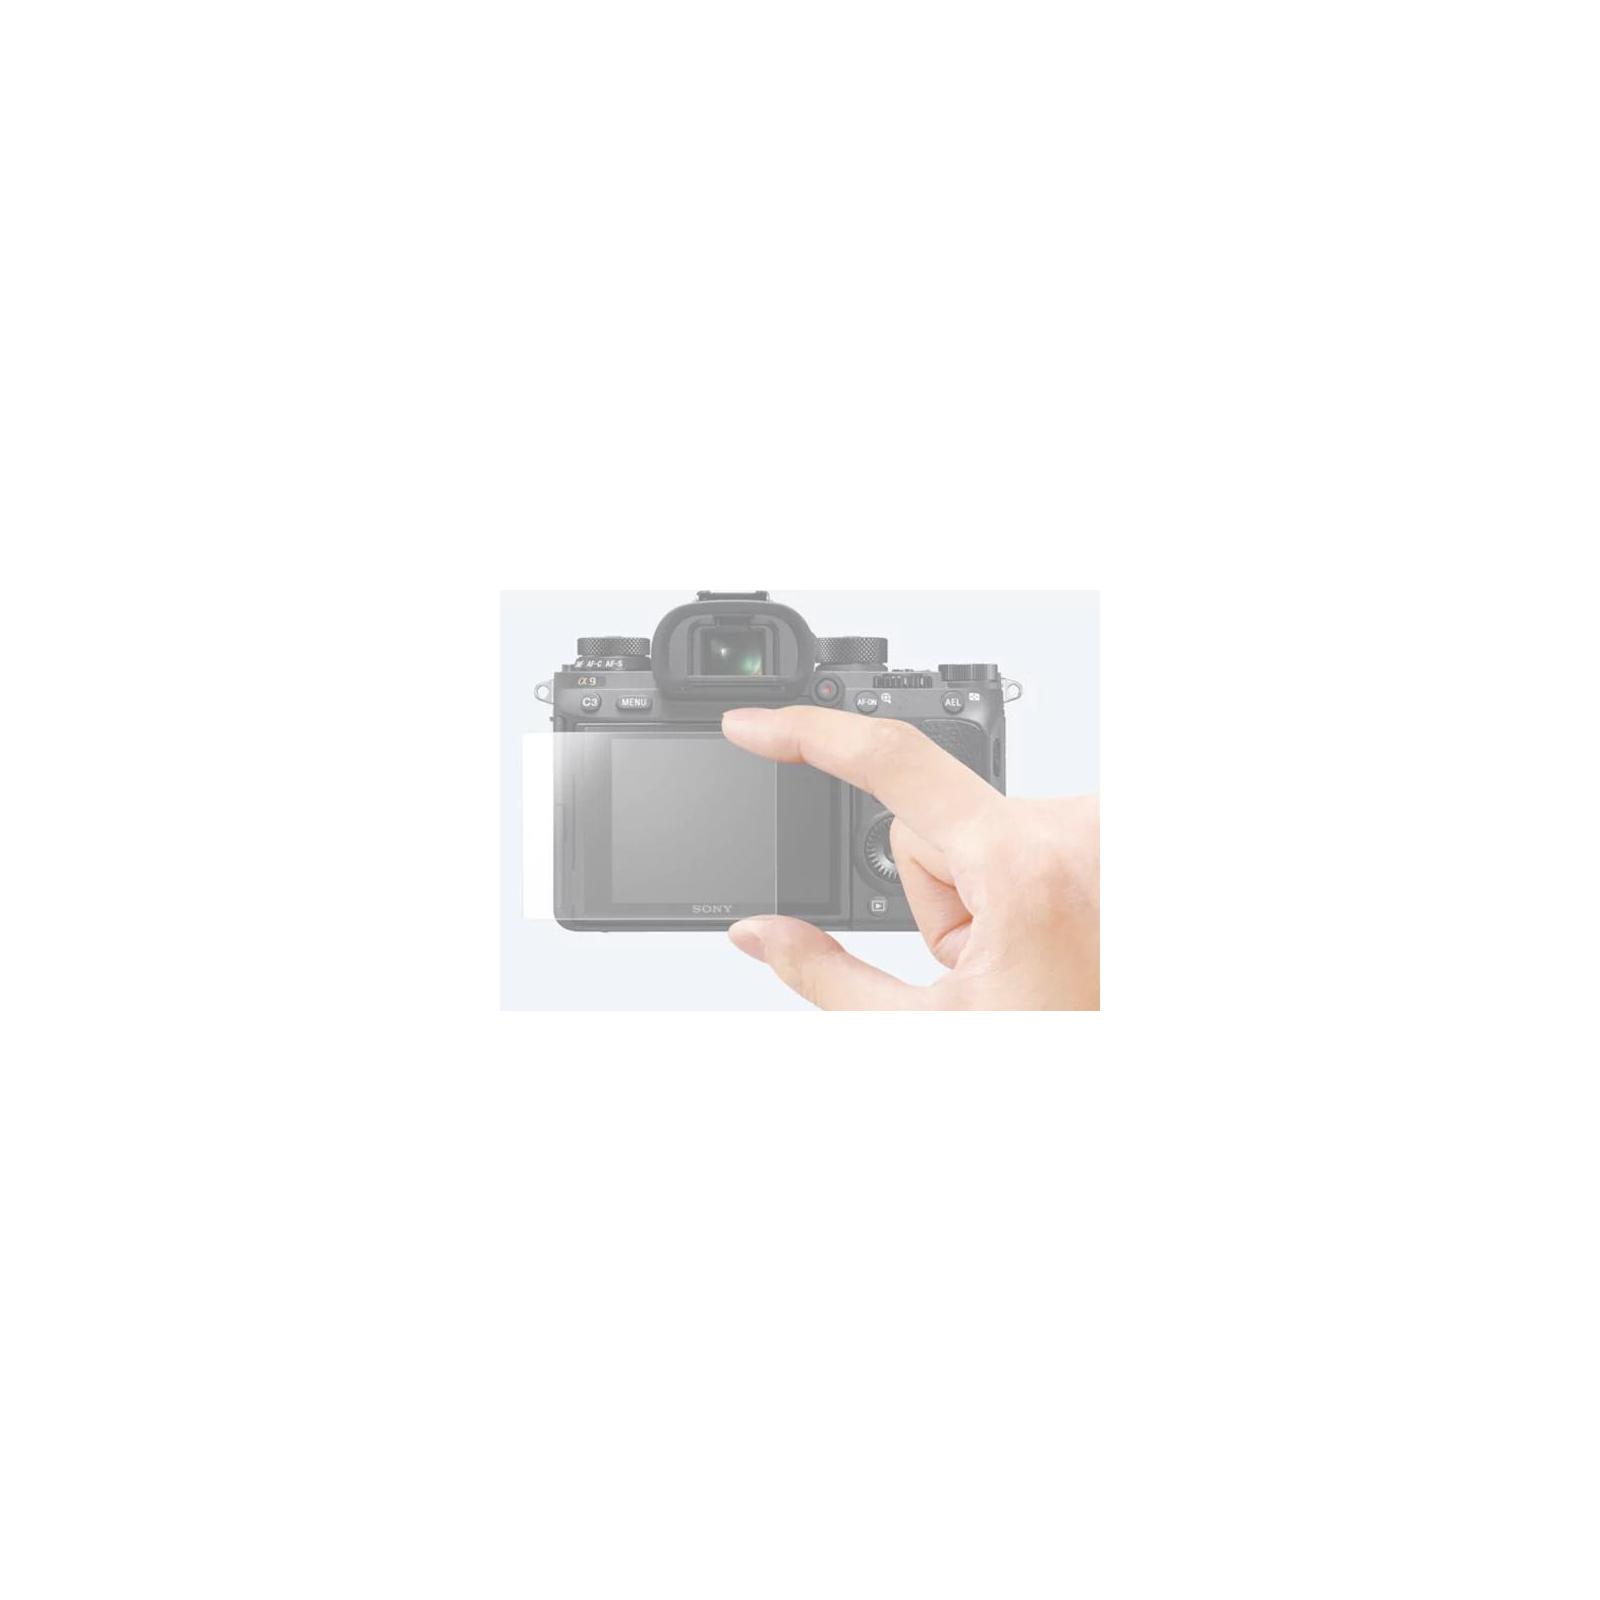 Стекло защитное SONY protection film for PCK LG1 (PCKLG1.SYH)